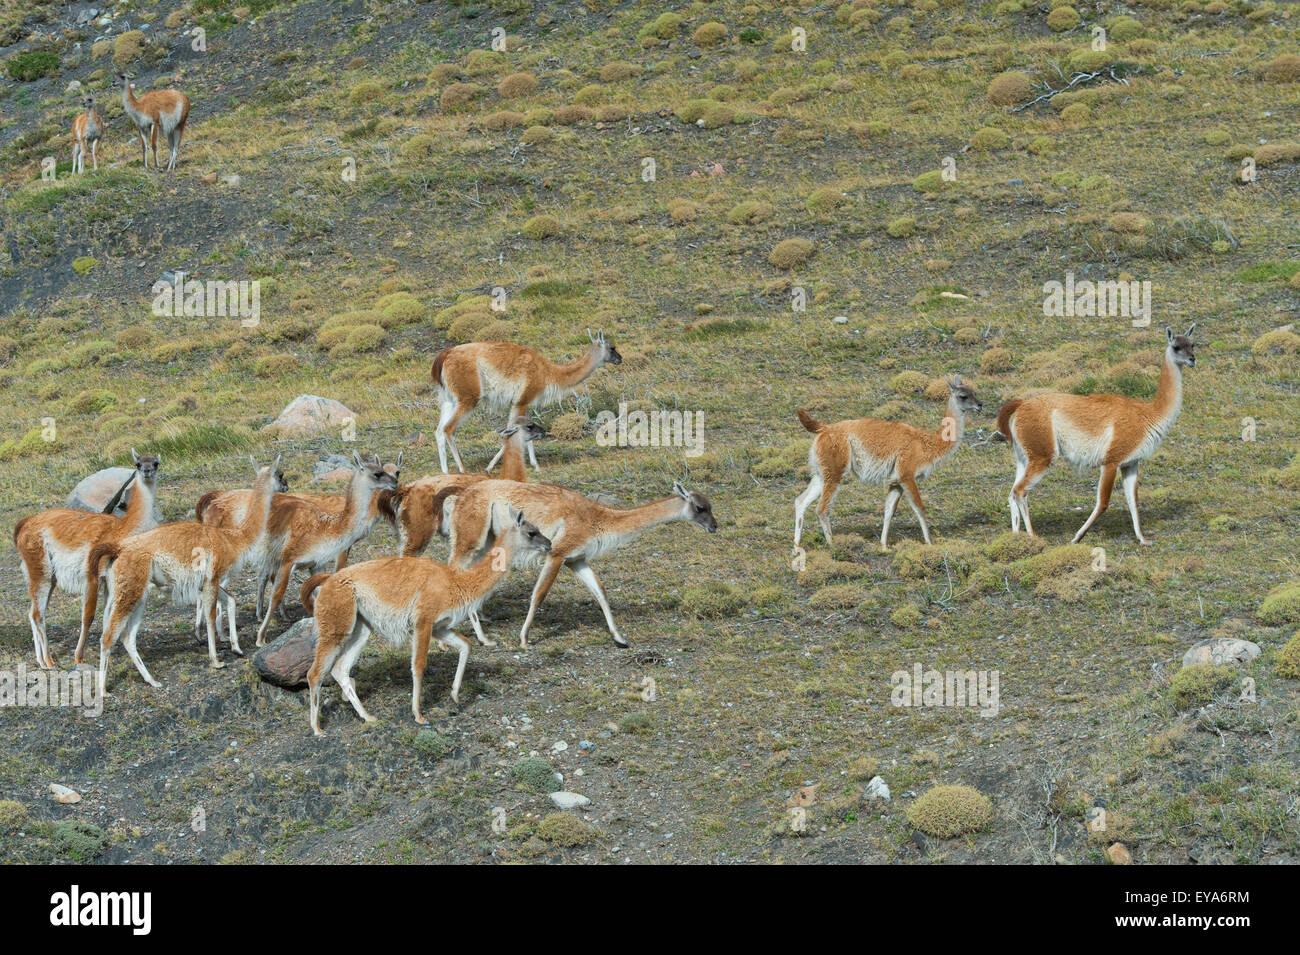 Guanacos (Lama guanicoe), Torres del Paine National Park, Chilean Patagonia, Chile - Stock Image